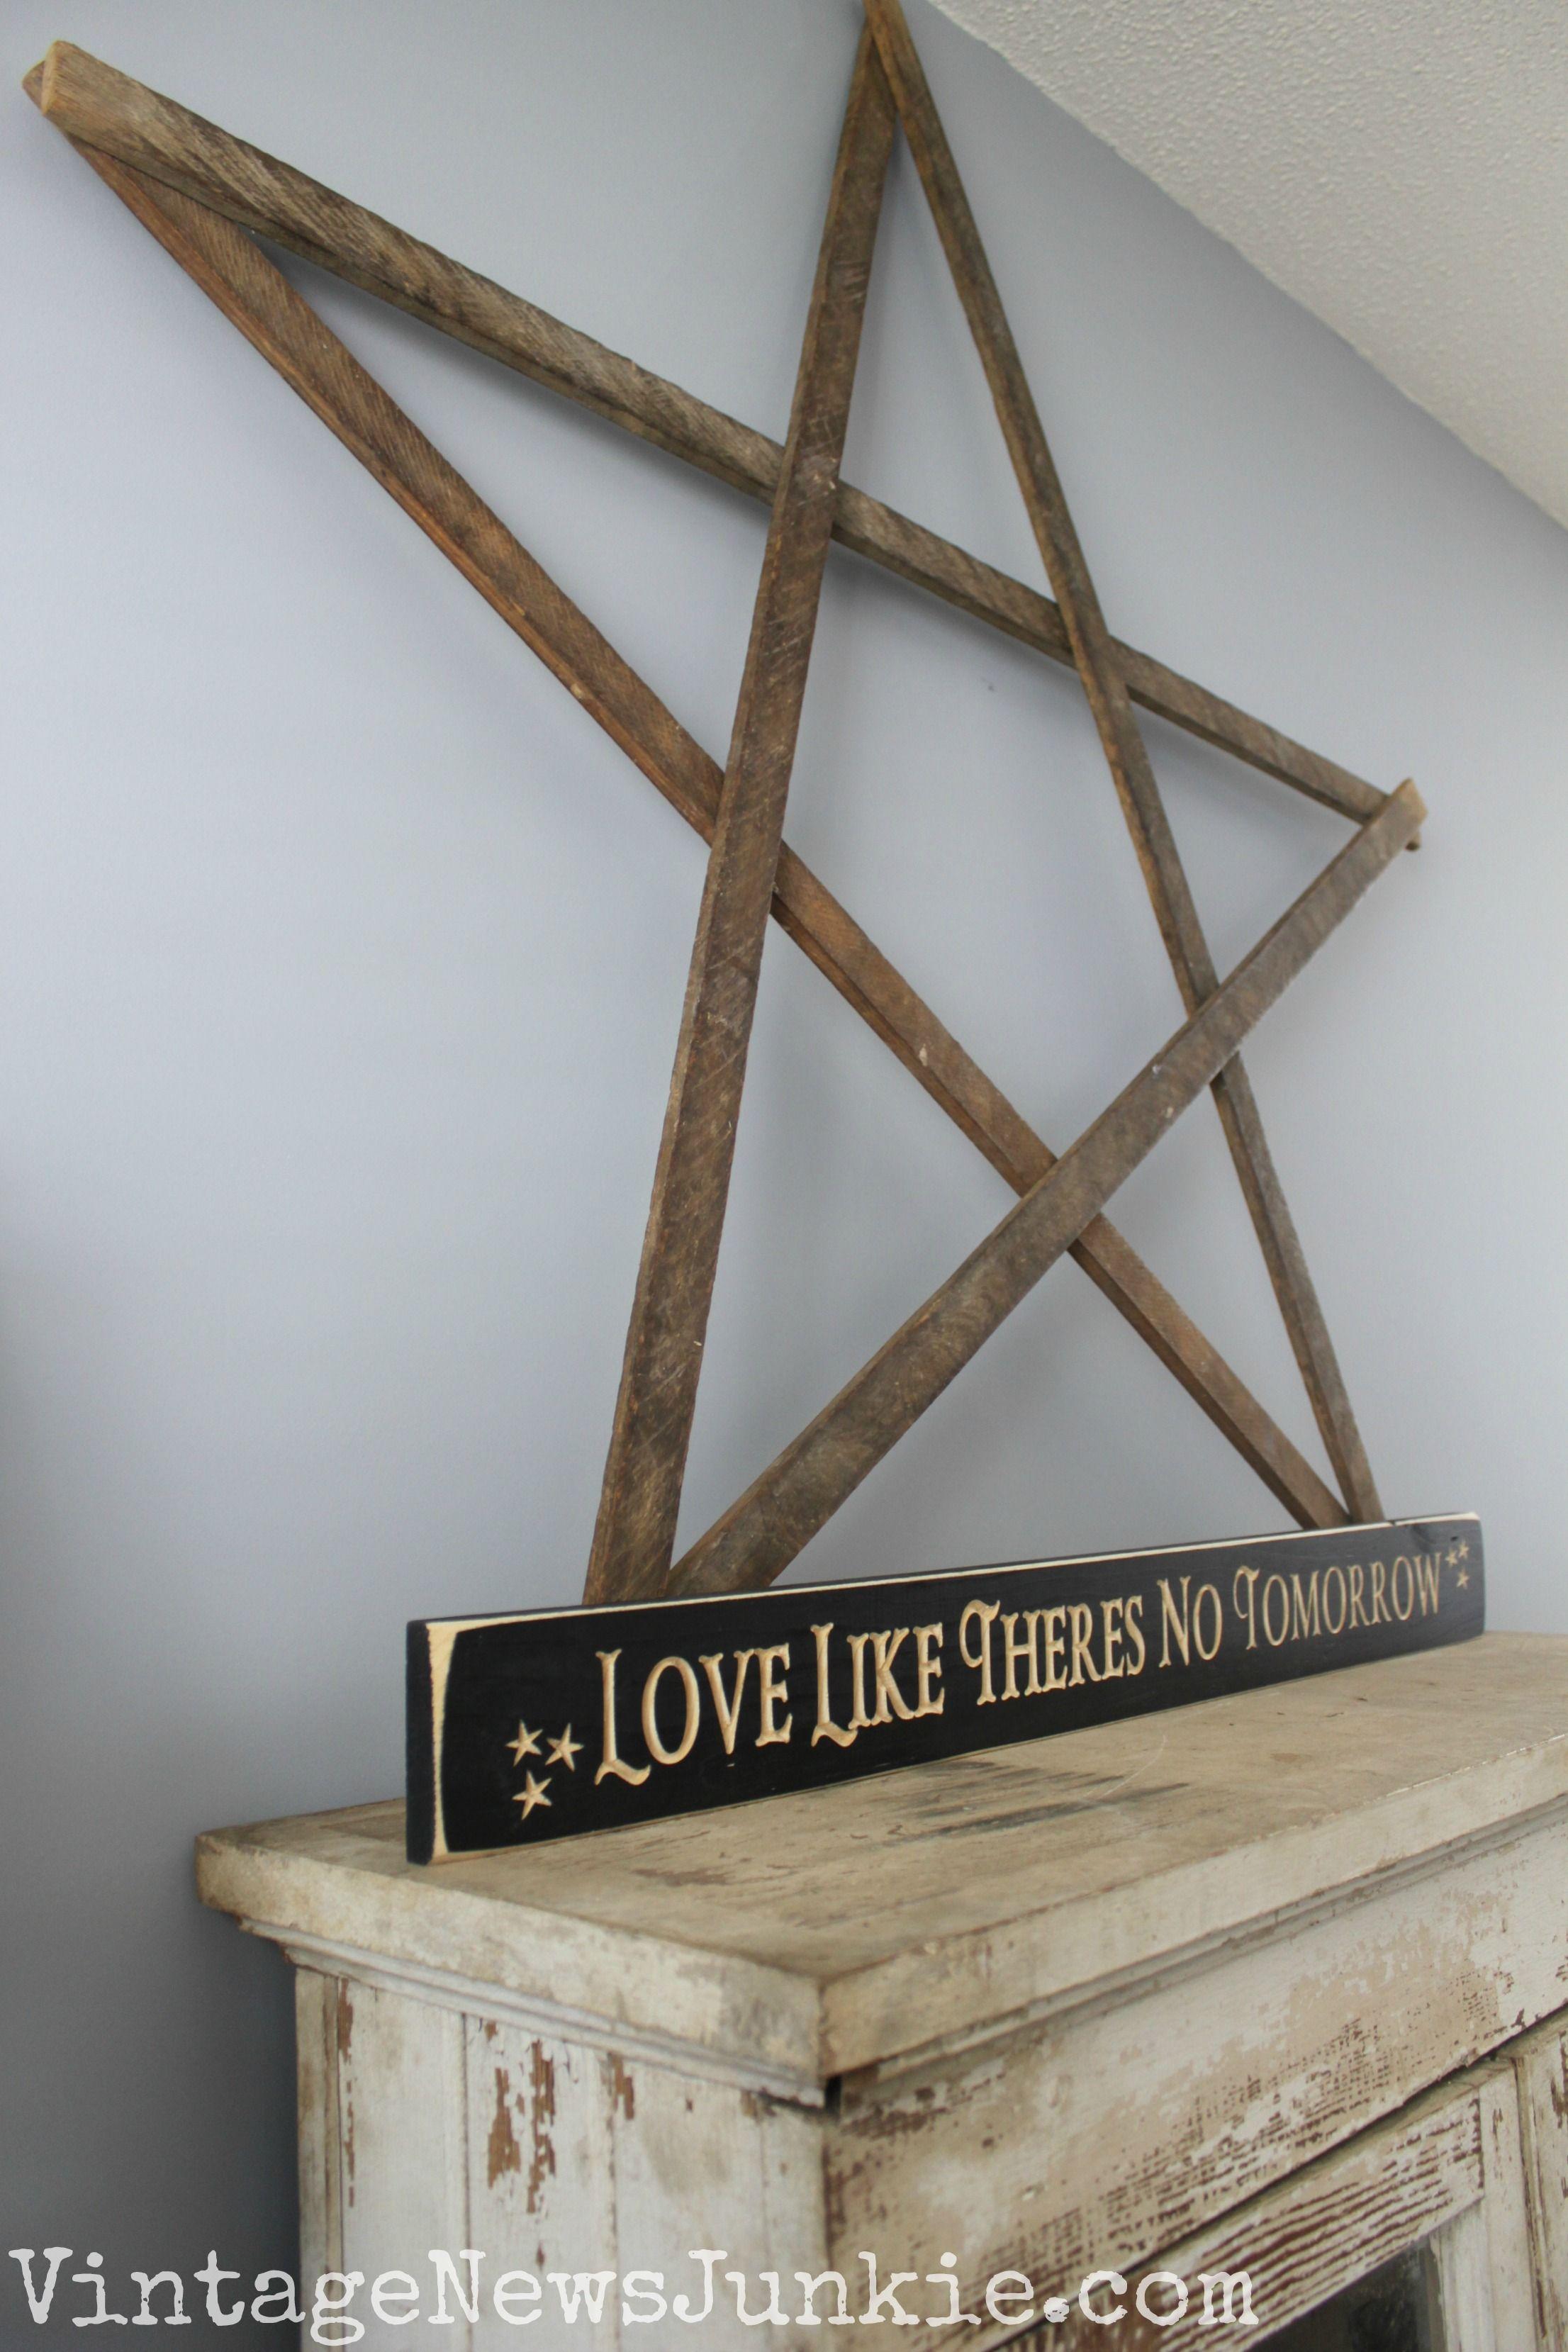 Five Minute DIY Wooden Stars Wooden diy, Wooden crafts